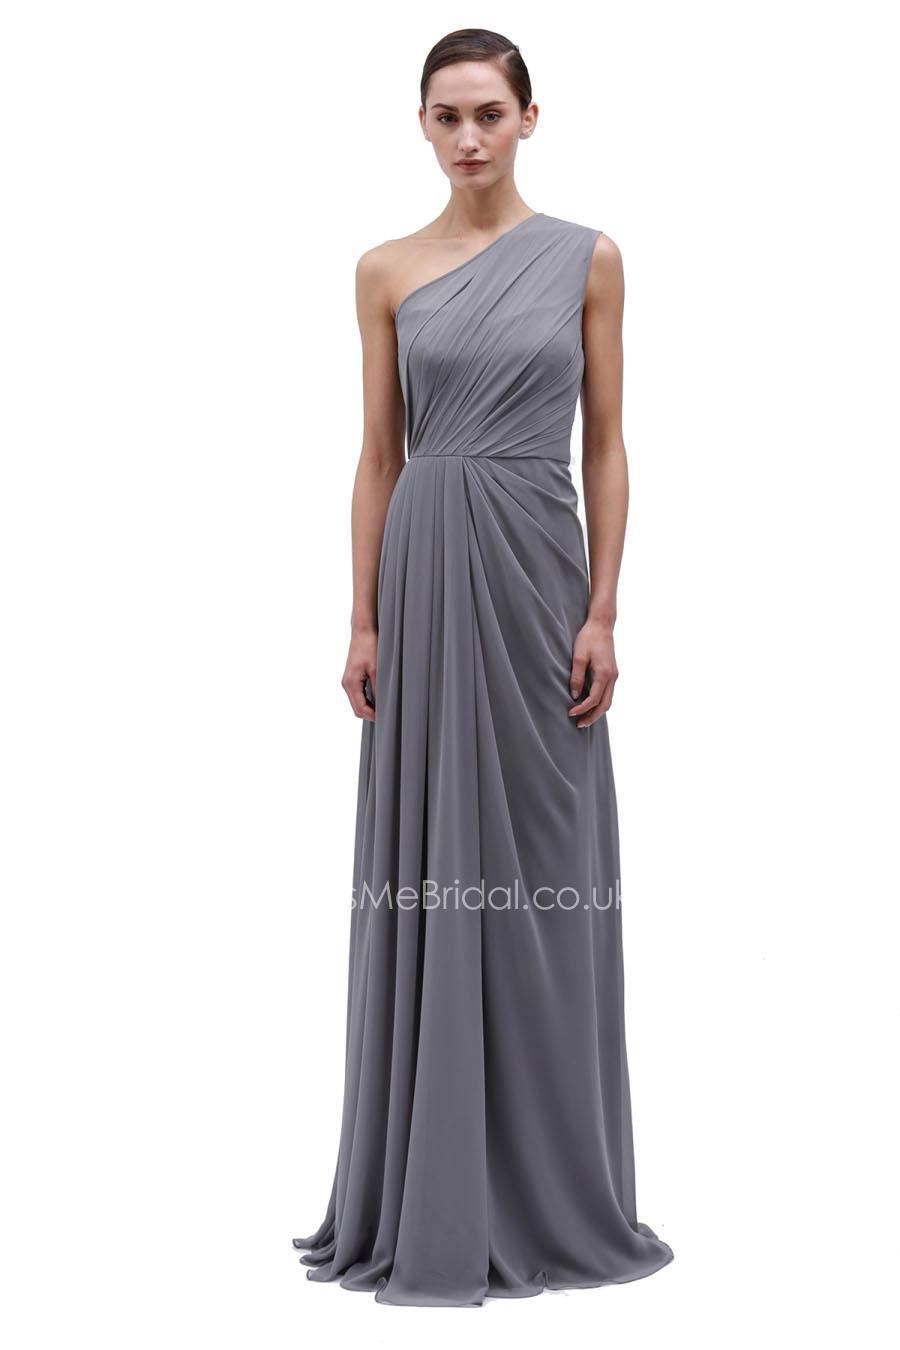 Chiffon grey sleeveless one shoulder floor length bridesmaid dress